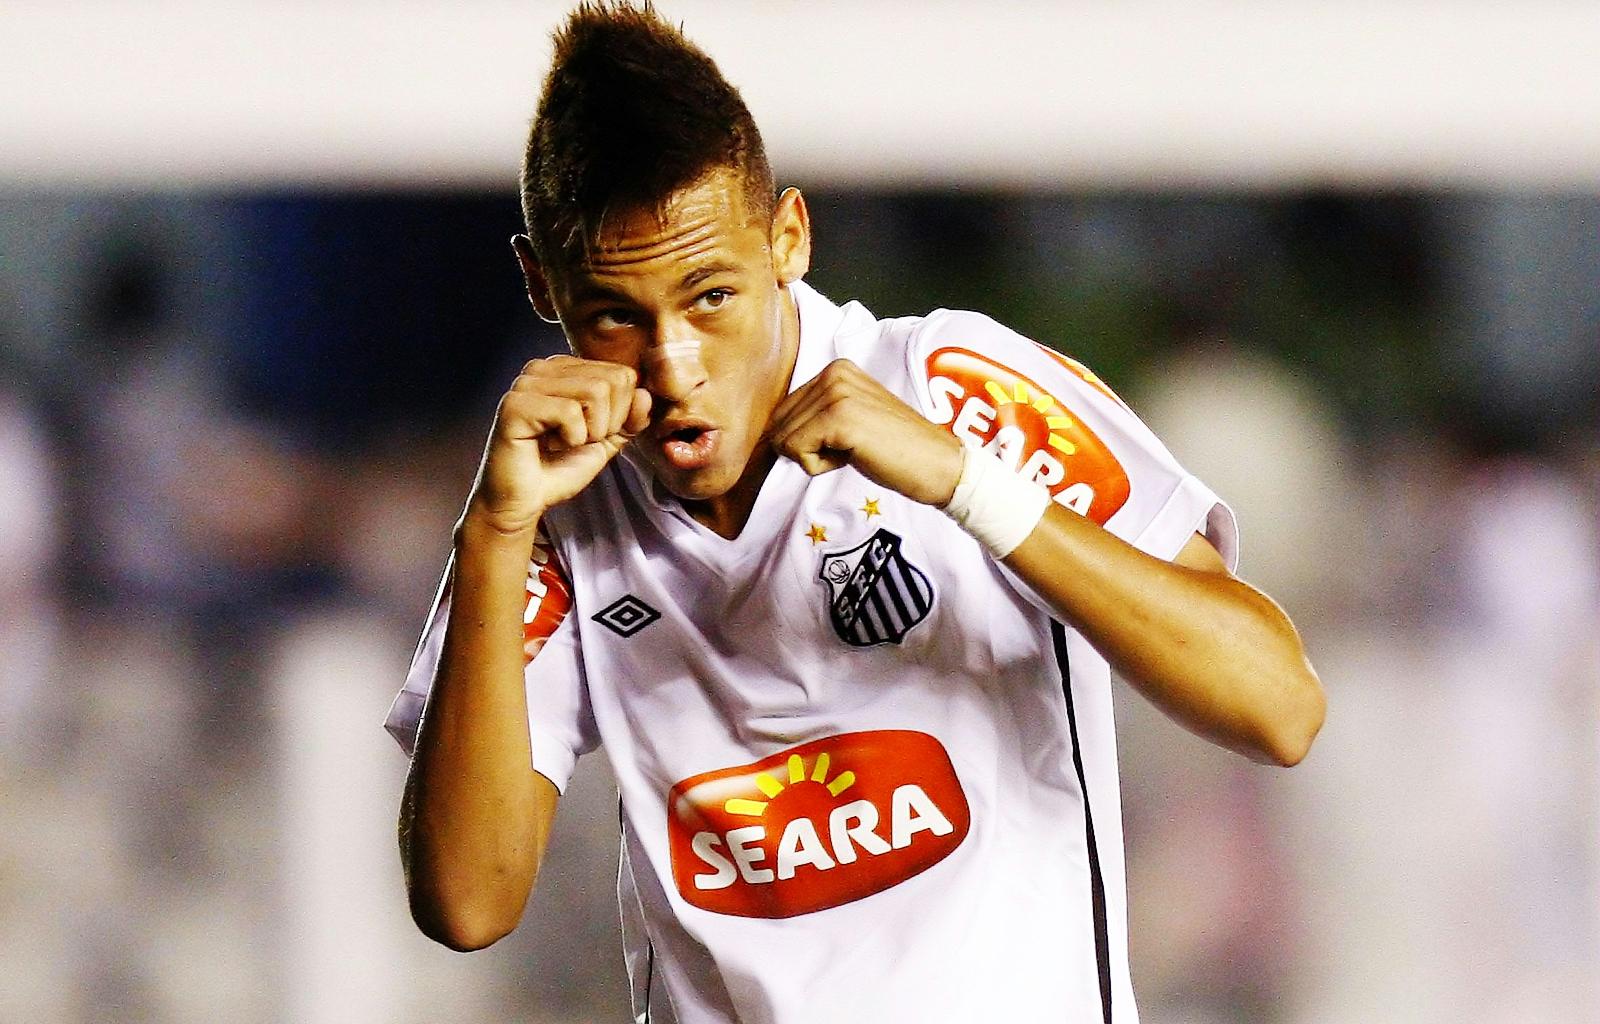 http://4.bp.blogspot.com/-bktY6elUYWg/UEFvr6-qGNI/AAAAAAAAF1k/cc9aSW0R_9A/s1600/Neymar%20Boxing%20Celebration.jpg